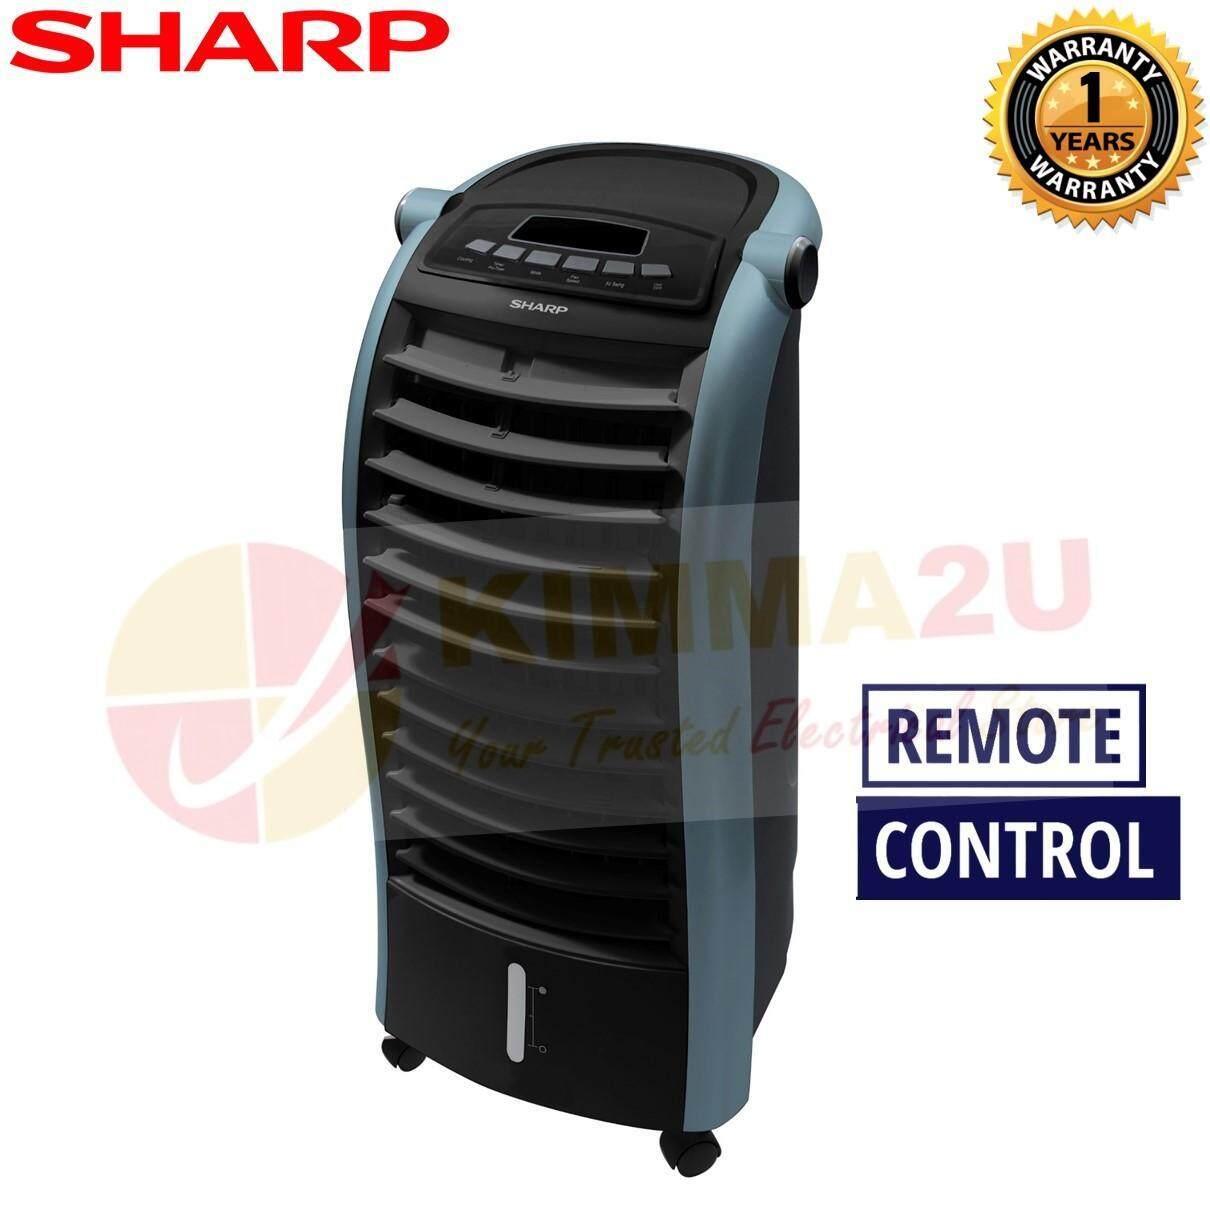 (RANDOM COLOUR) SHARP PJA36TV EVAPORATIVE AIR COOLER with REMOTE CONTROL